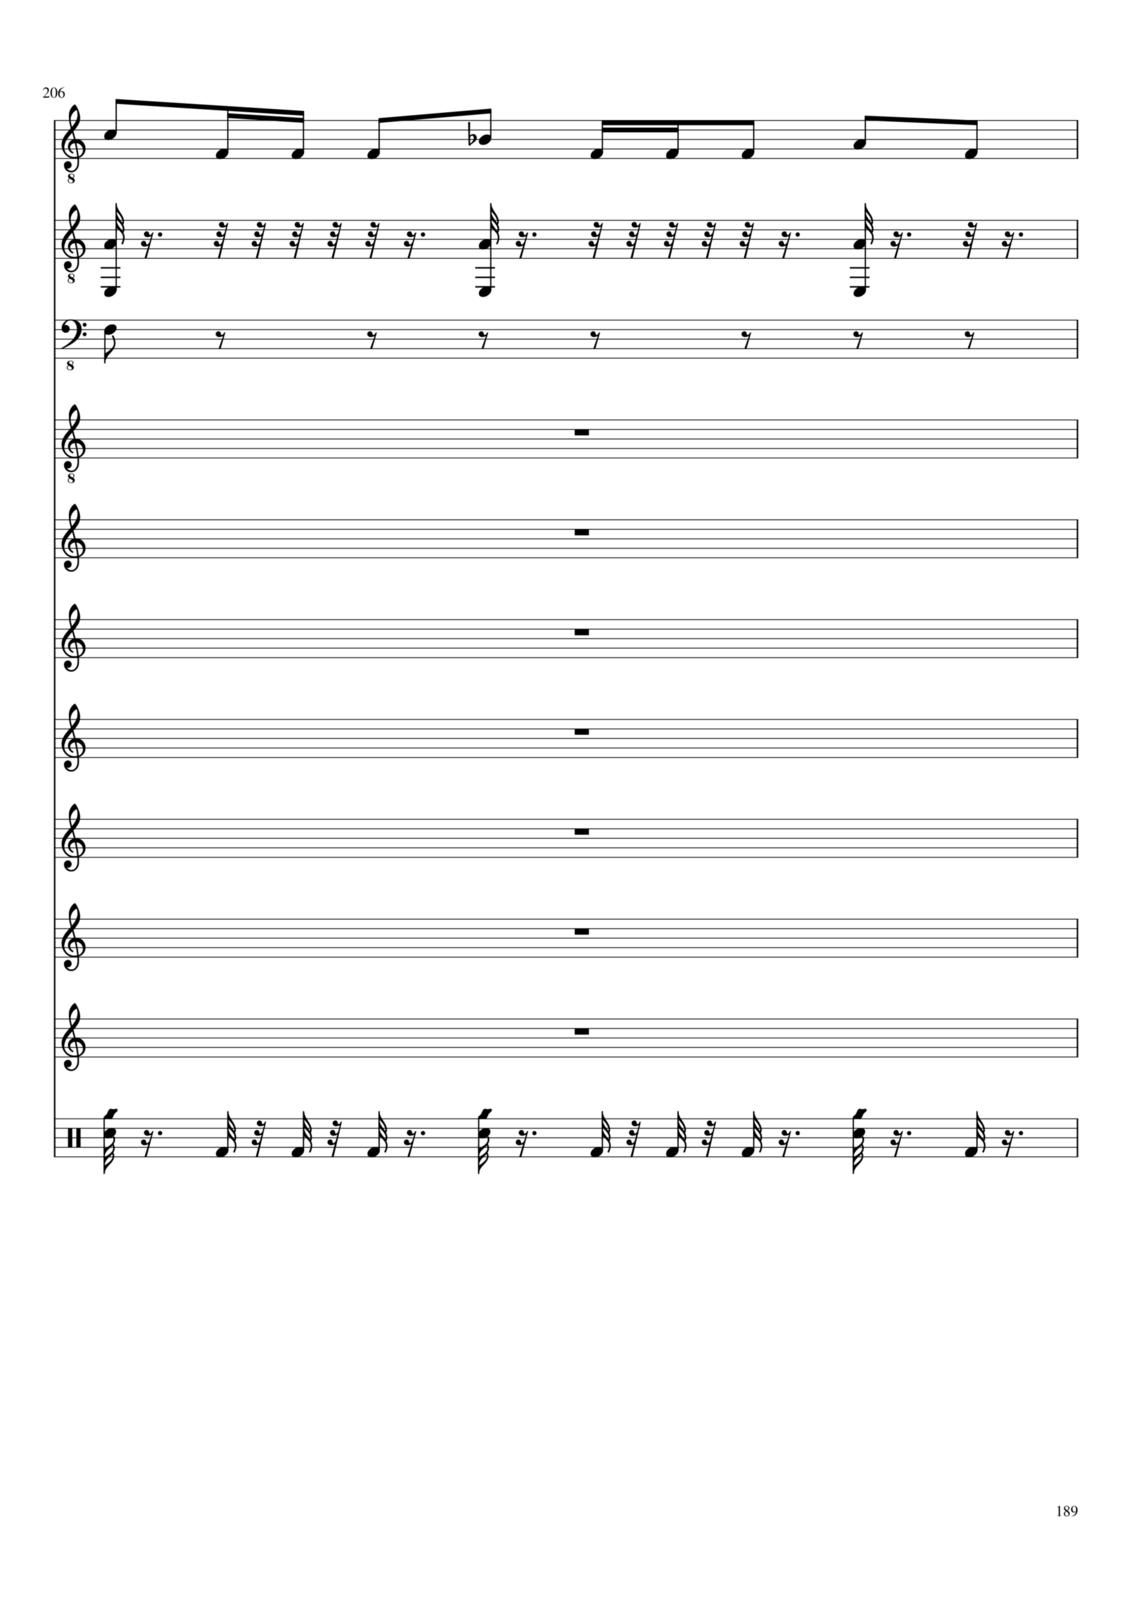 Belyiy sokol slide, Image 189